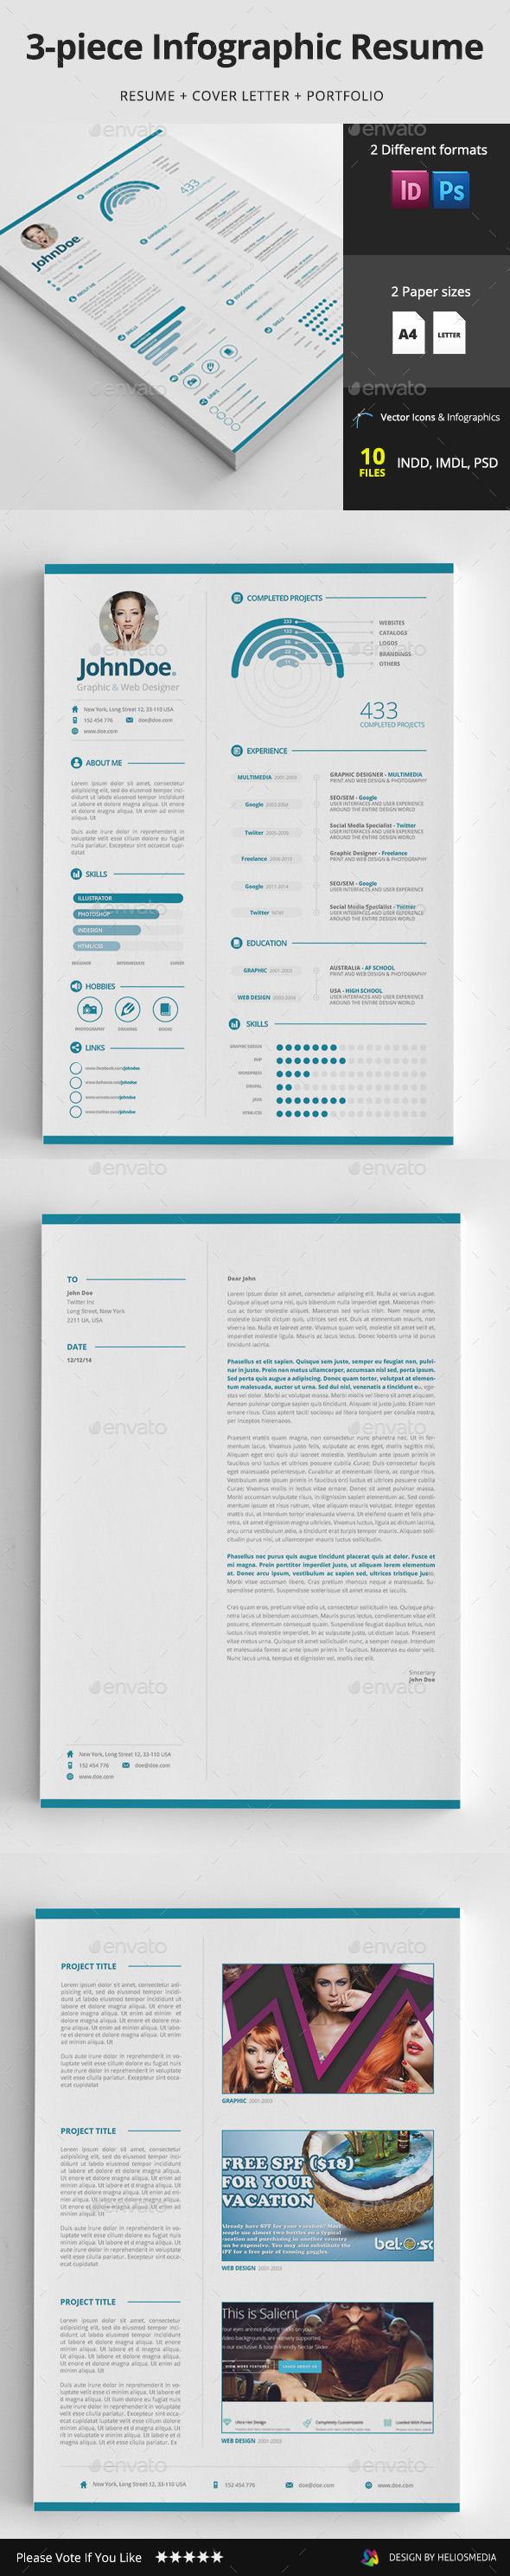 3 Piece Infographic Resume Cv By Heliosmedia Graphicriver